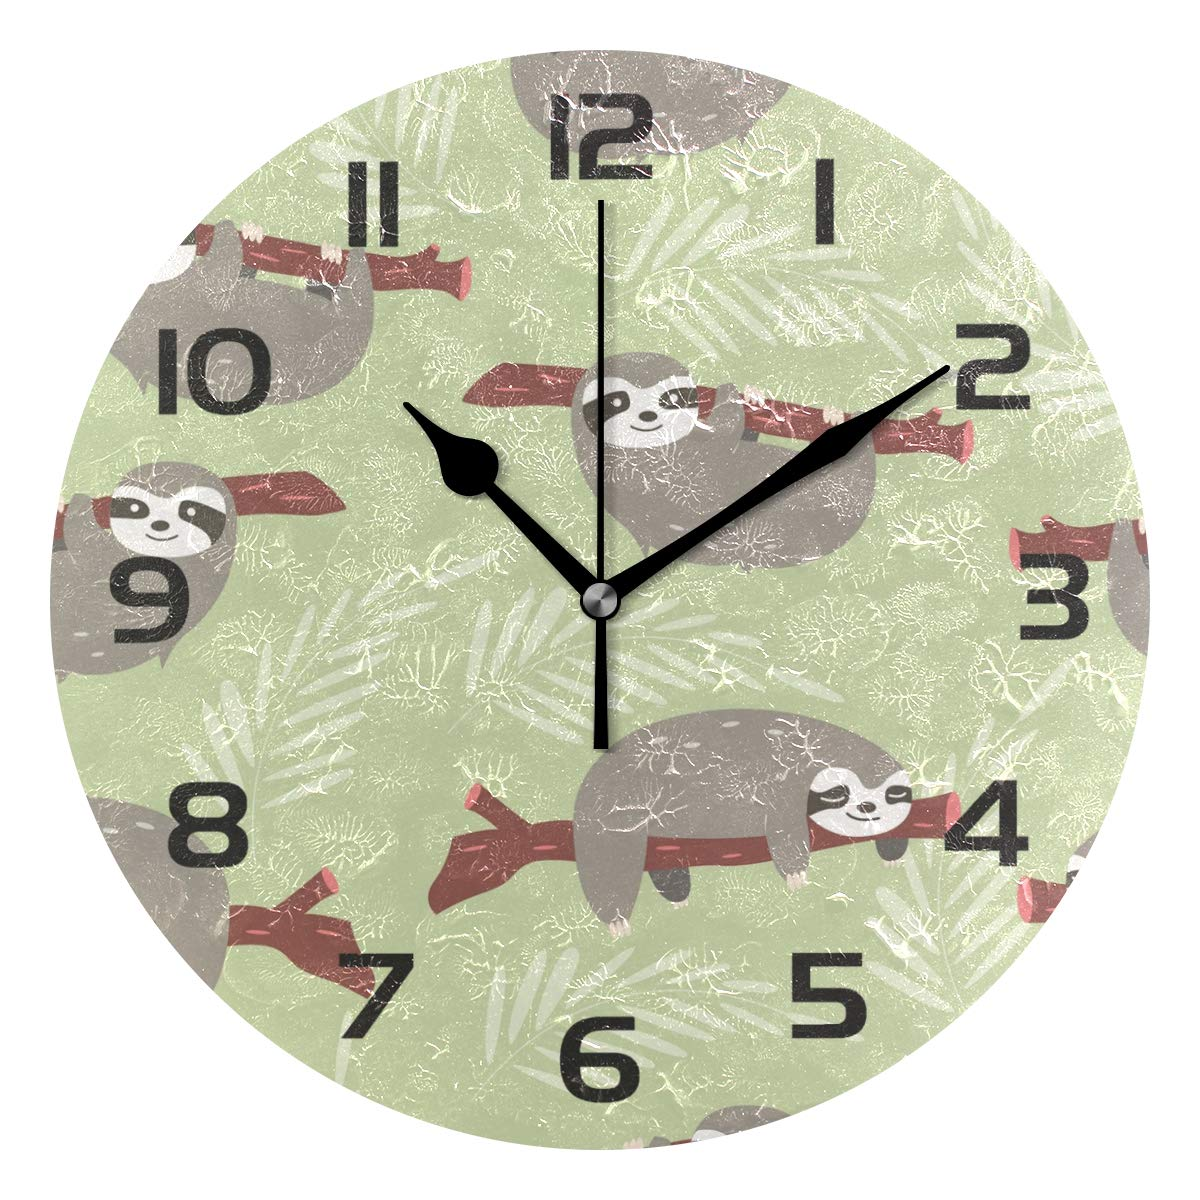 TropicalLife Cute Sloth Decorative Wall Clock Acrylic Round Clocks Non Ticking Art Decor Bedroom Living Room Kitchen Bathroom Office School